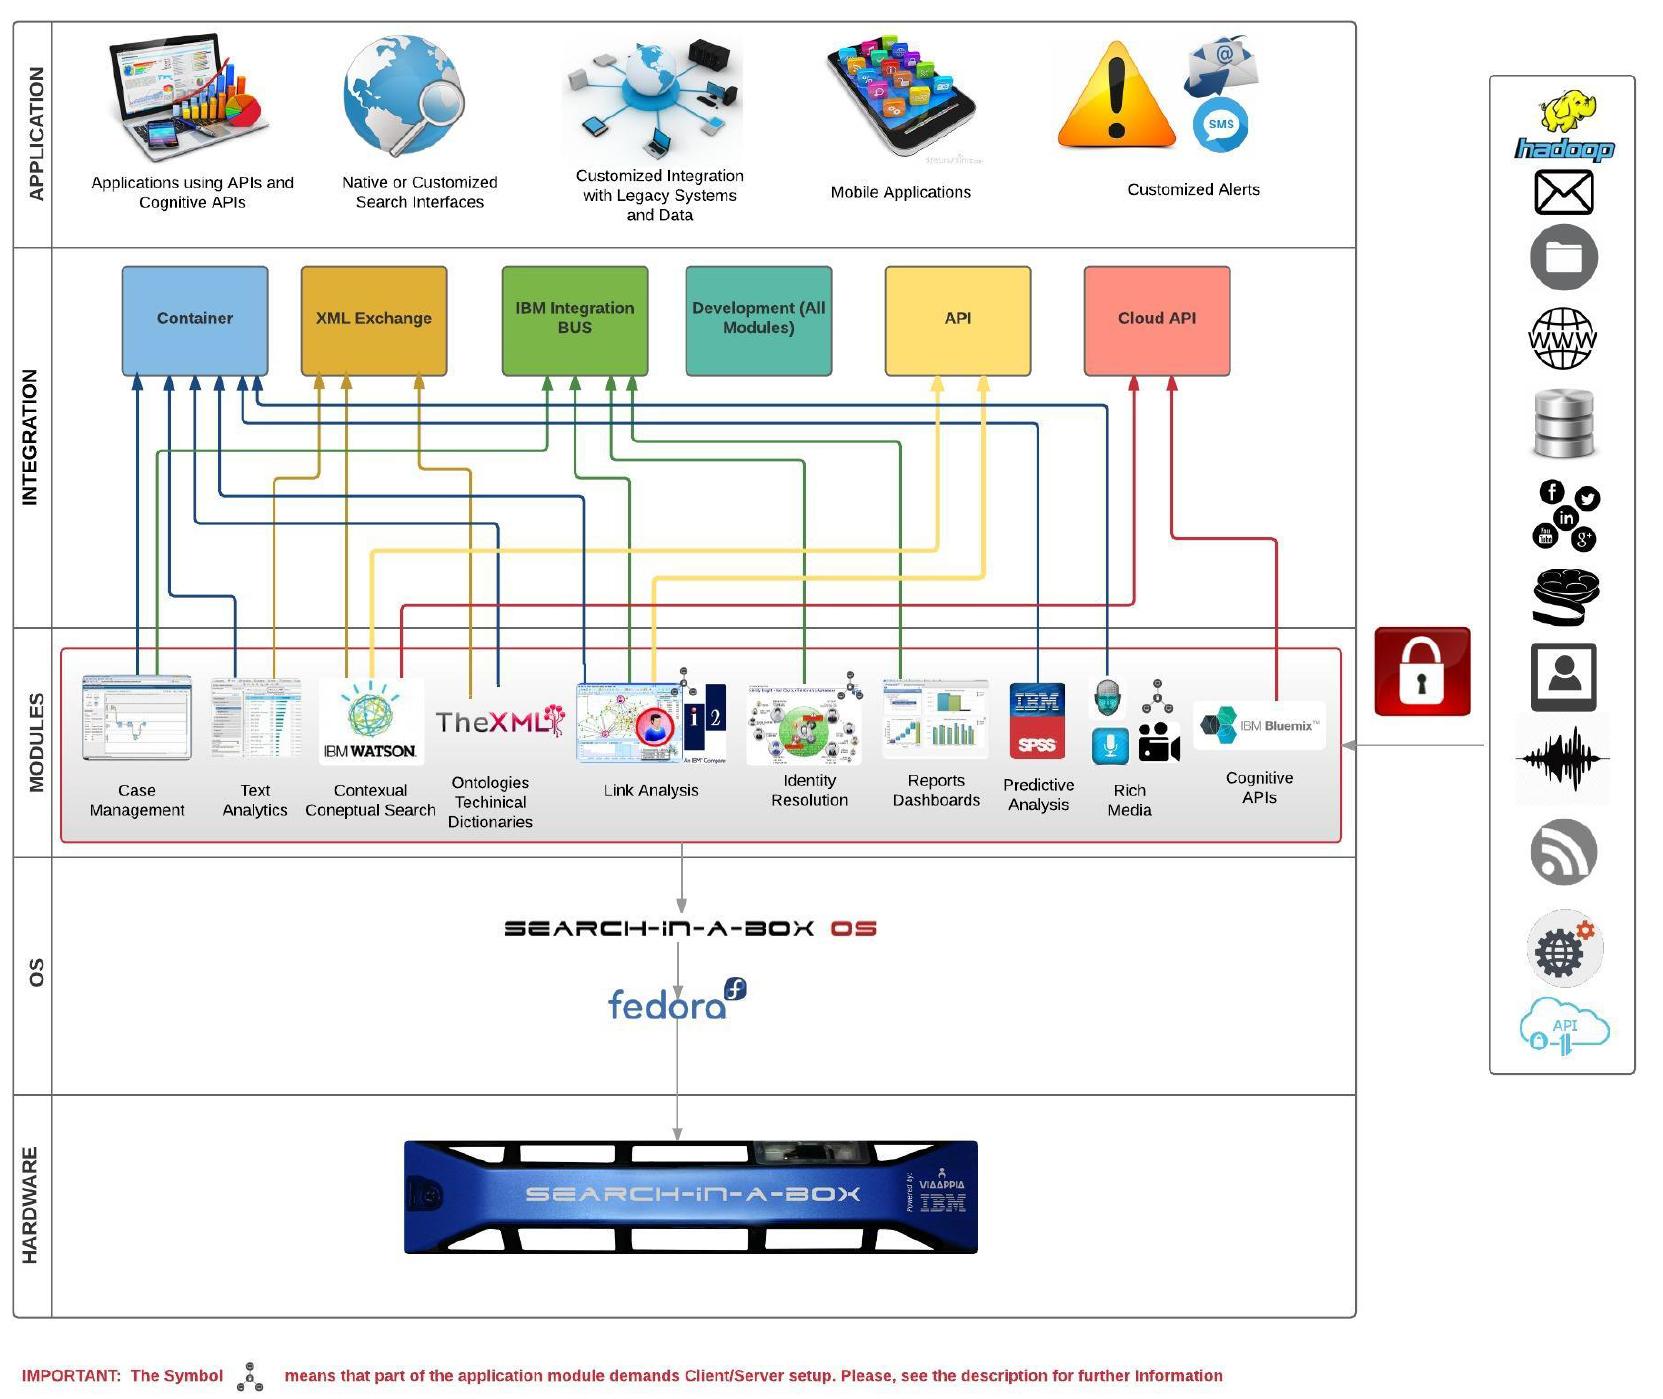 Microsoft Word - arquitetura siab.docx